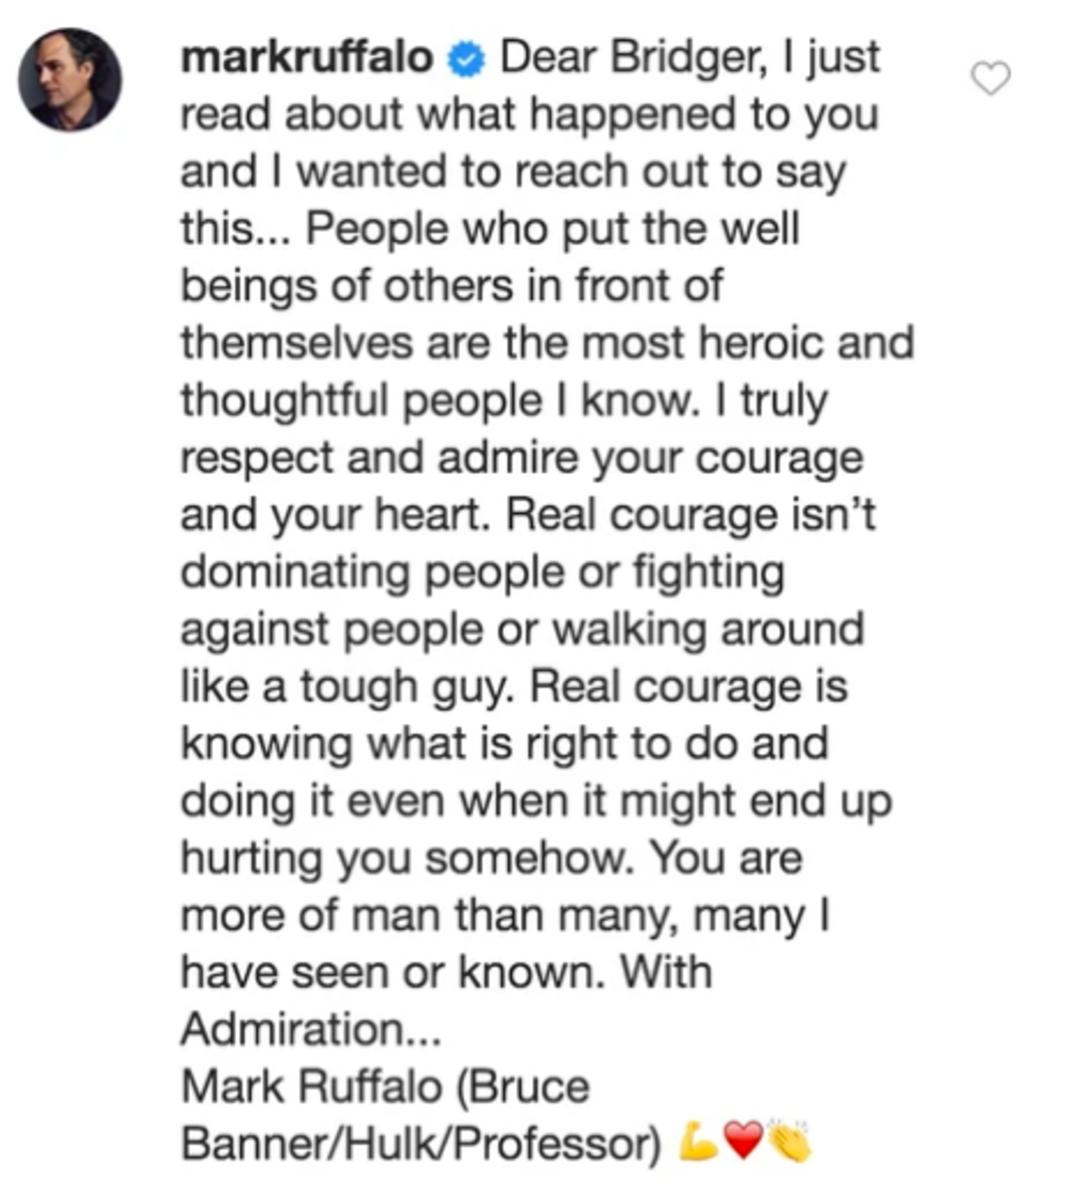 Mark Ruffalo Message to Bridger